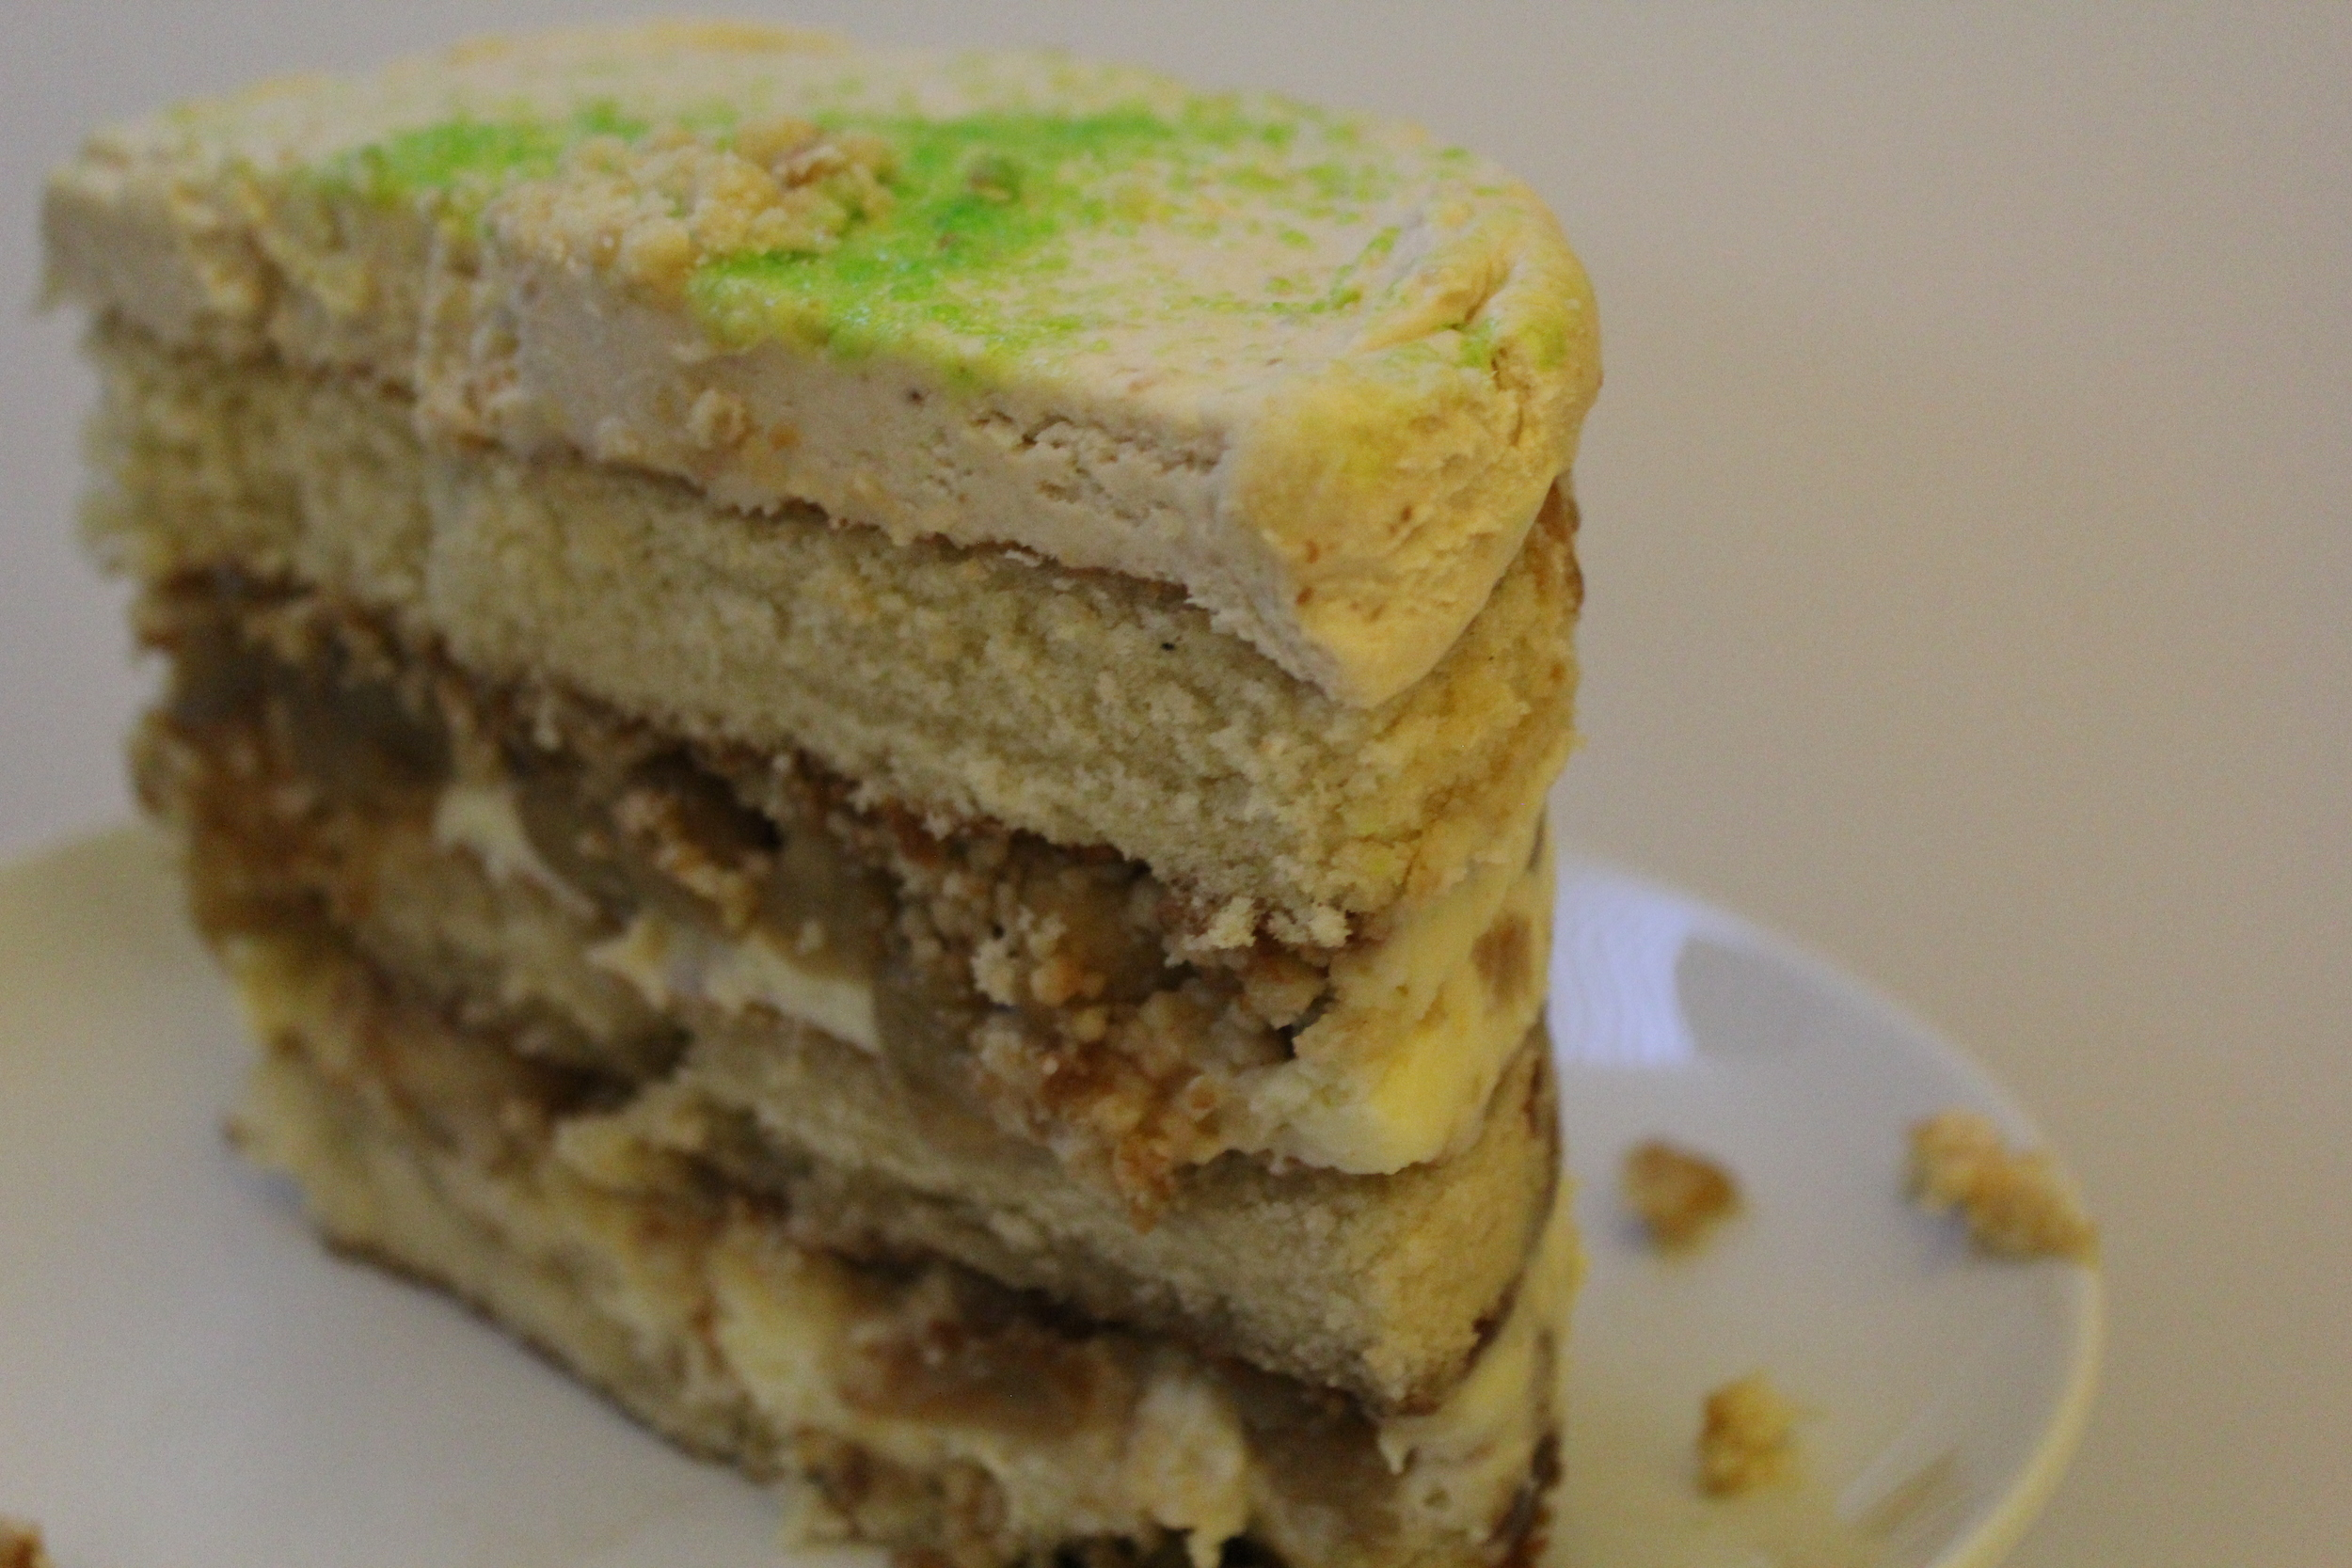 CAKE GUTS